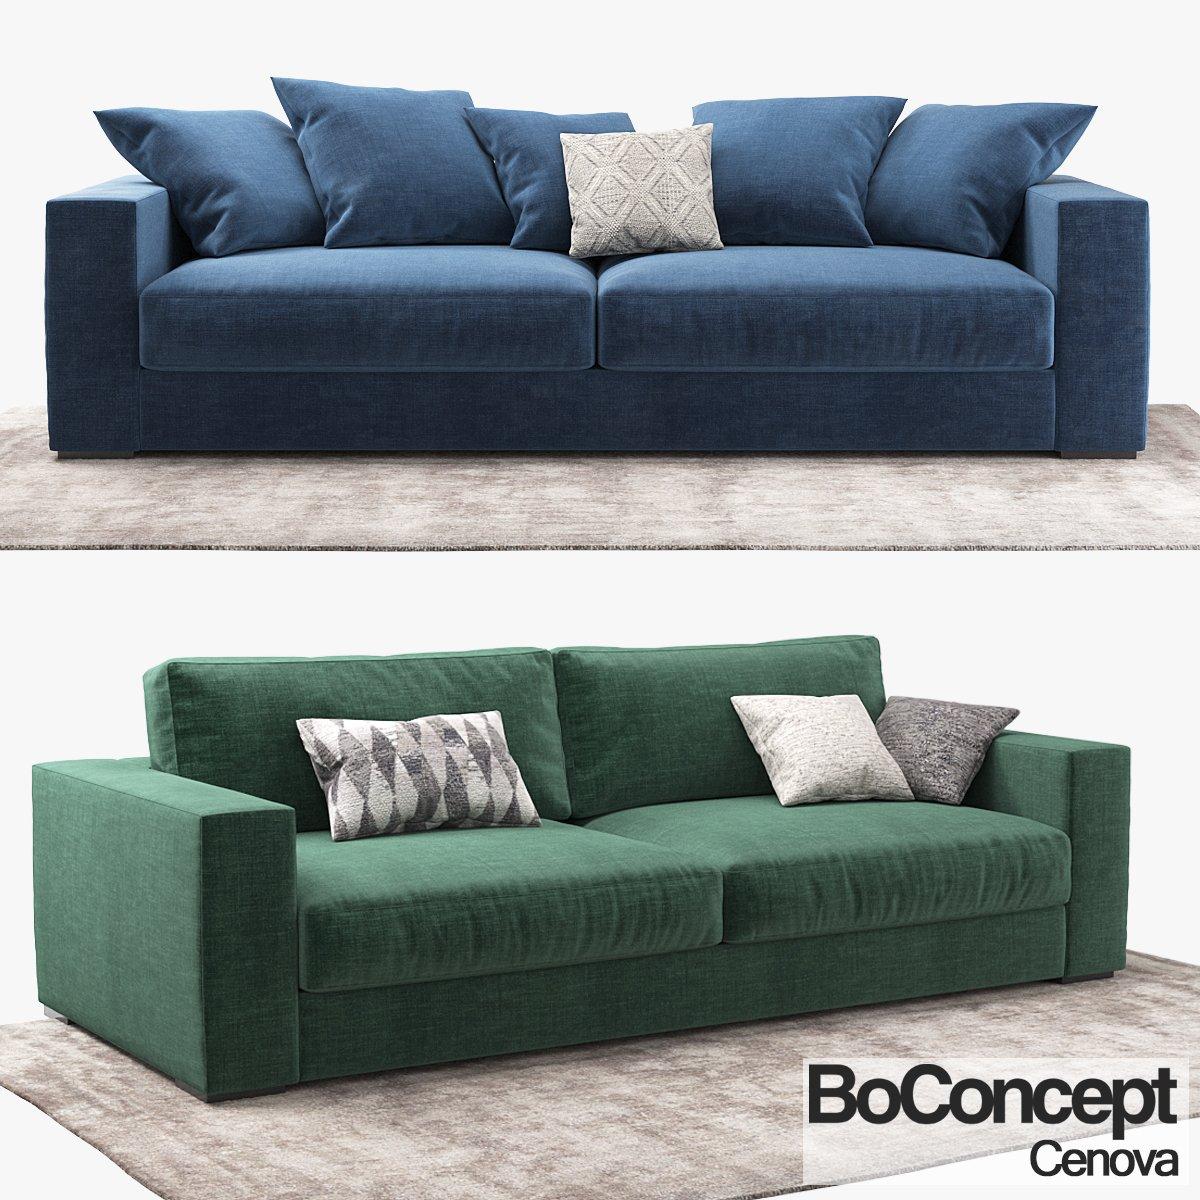 sofa boconcept cenova furniture creative market. Black Bedroom Furniture Sets. Home Design Ideas